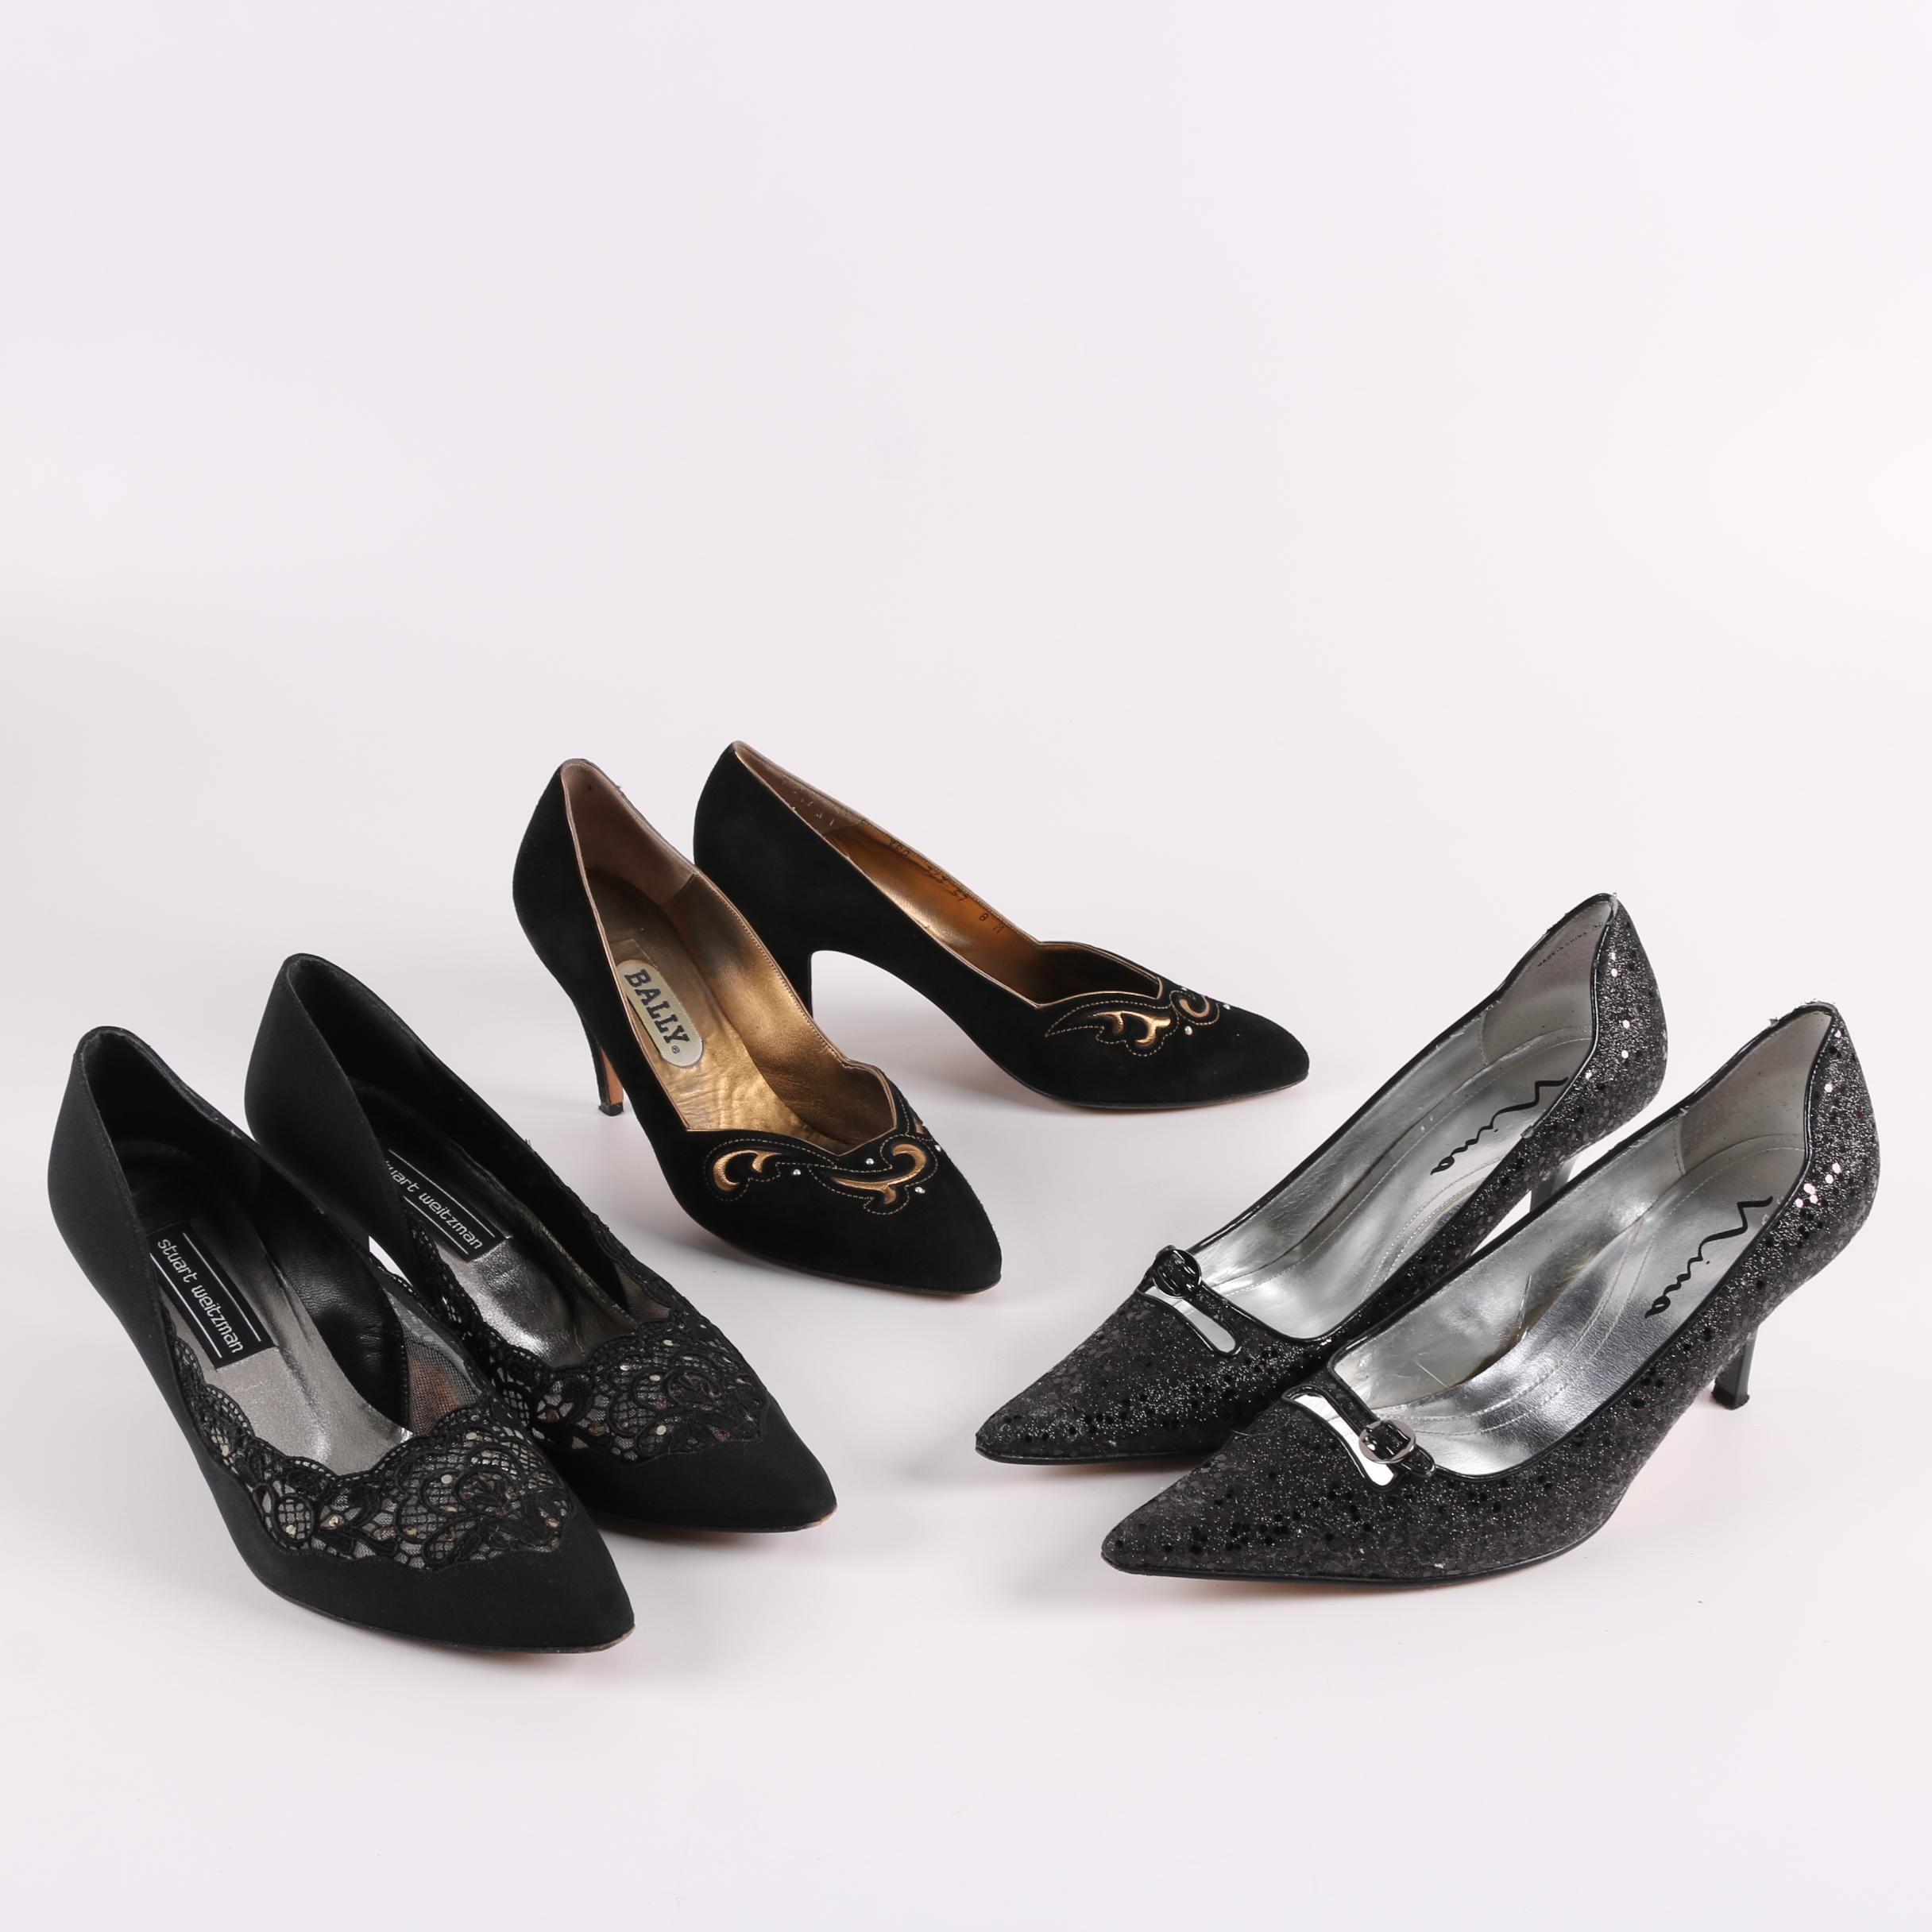 Stuart Weitzman, Bally and Nina High-Heeled Dress Shoes